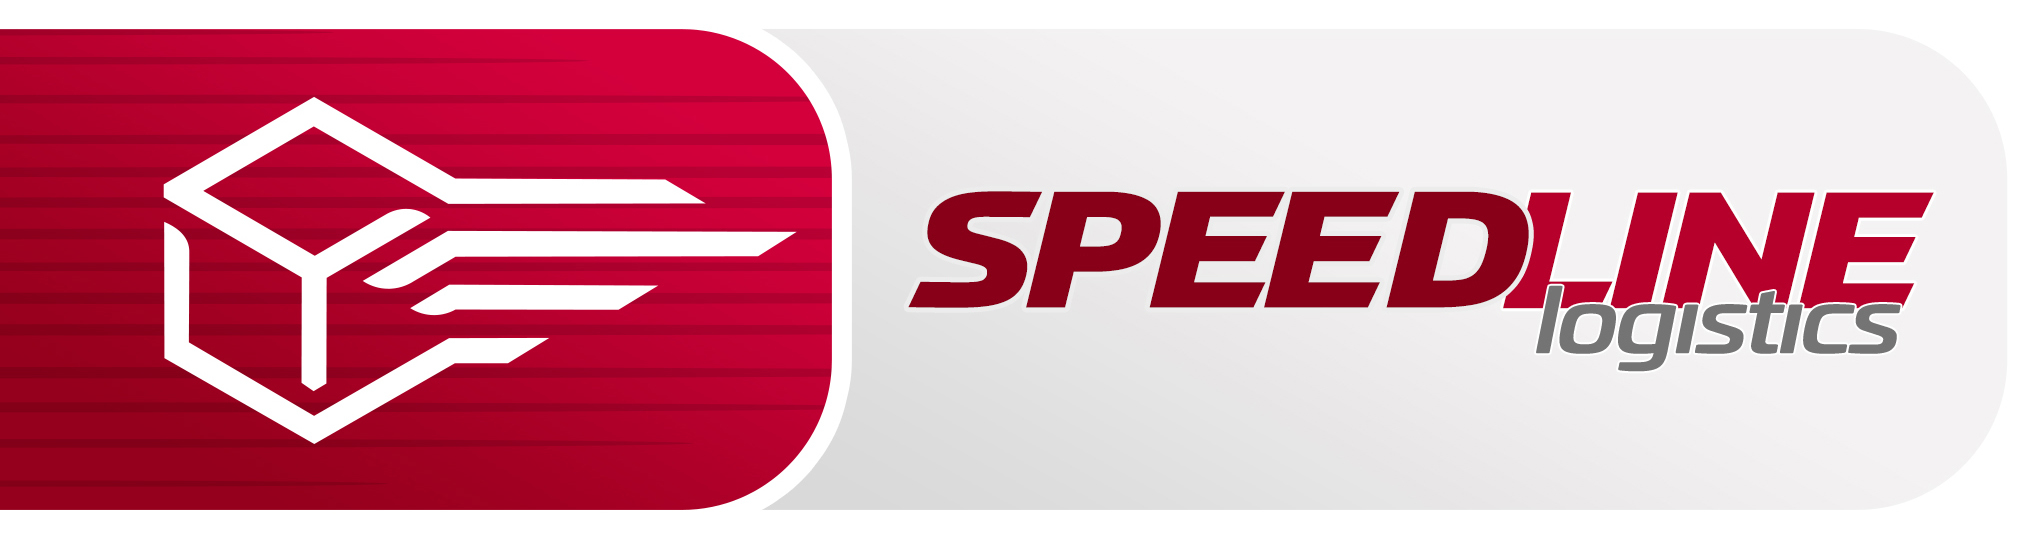 speedlinelogonadcoyj4a.jpg